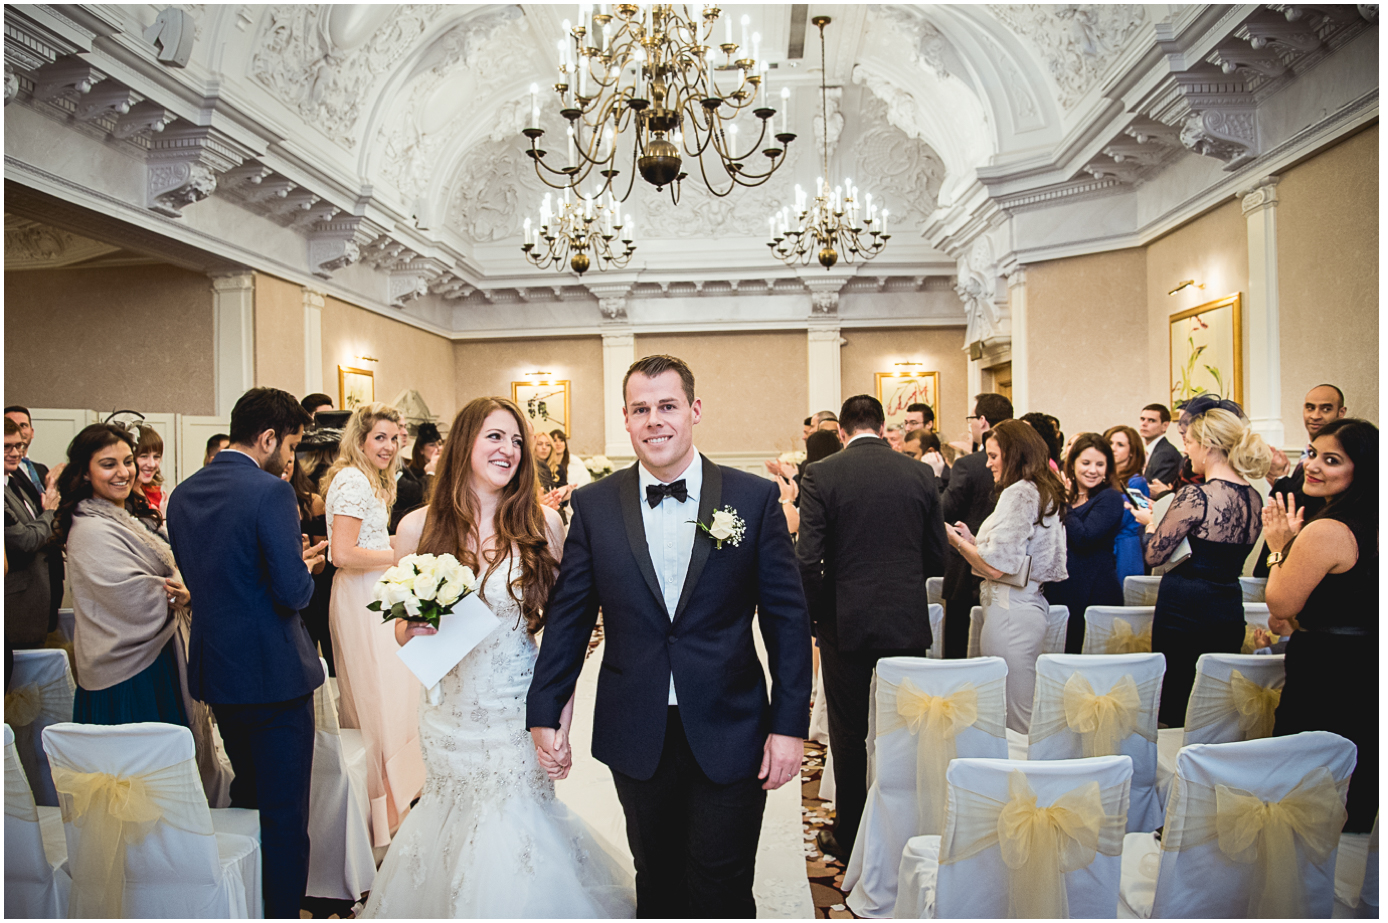 41 - Esmat and Angus - St. Ermin's Hotel London wedding photographer